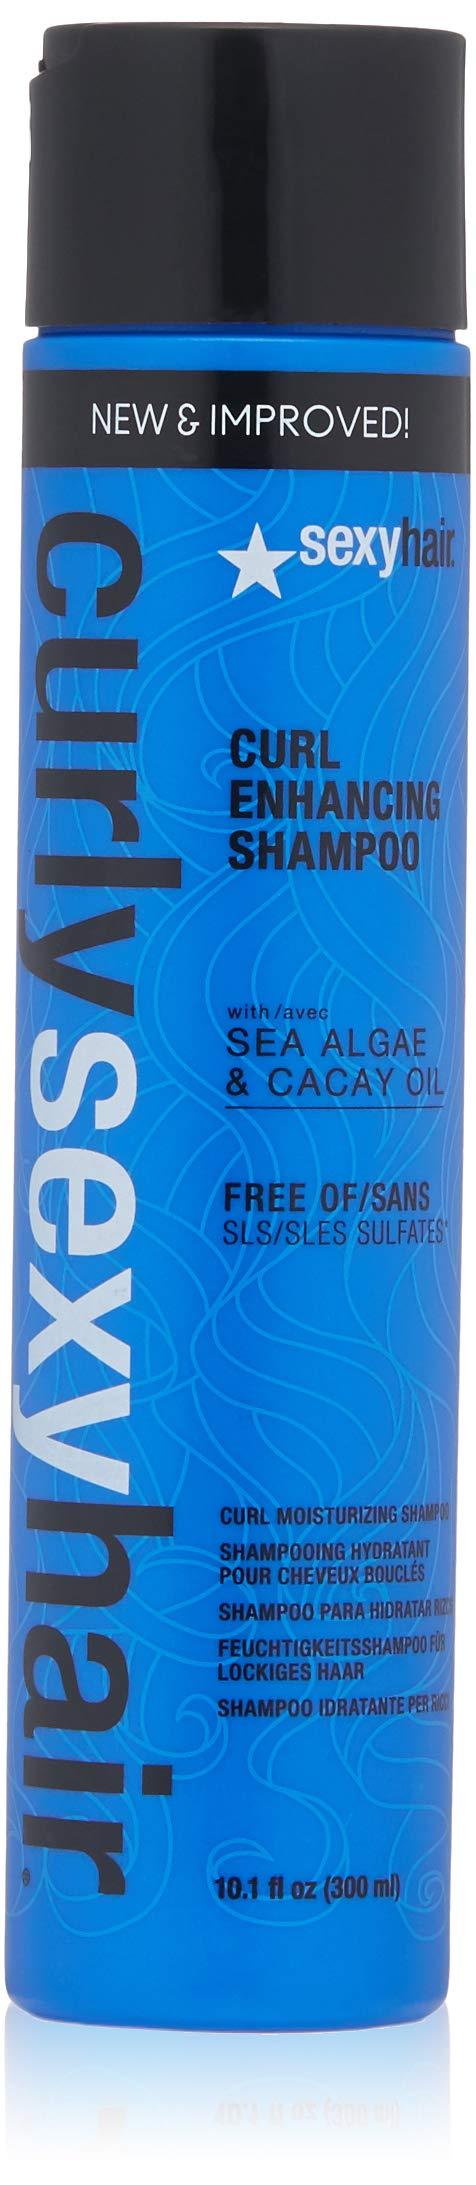 SEXYHAIR Curly Curl Enhancing Shampoo, 10.1 fl. oz. by SEXYHAIR